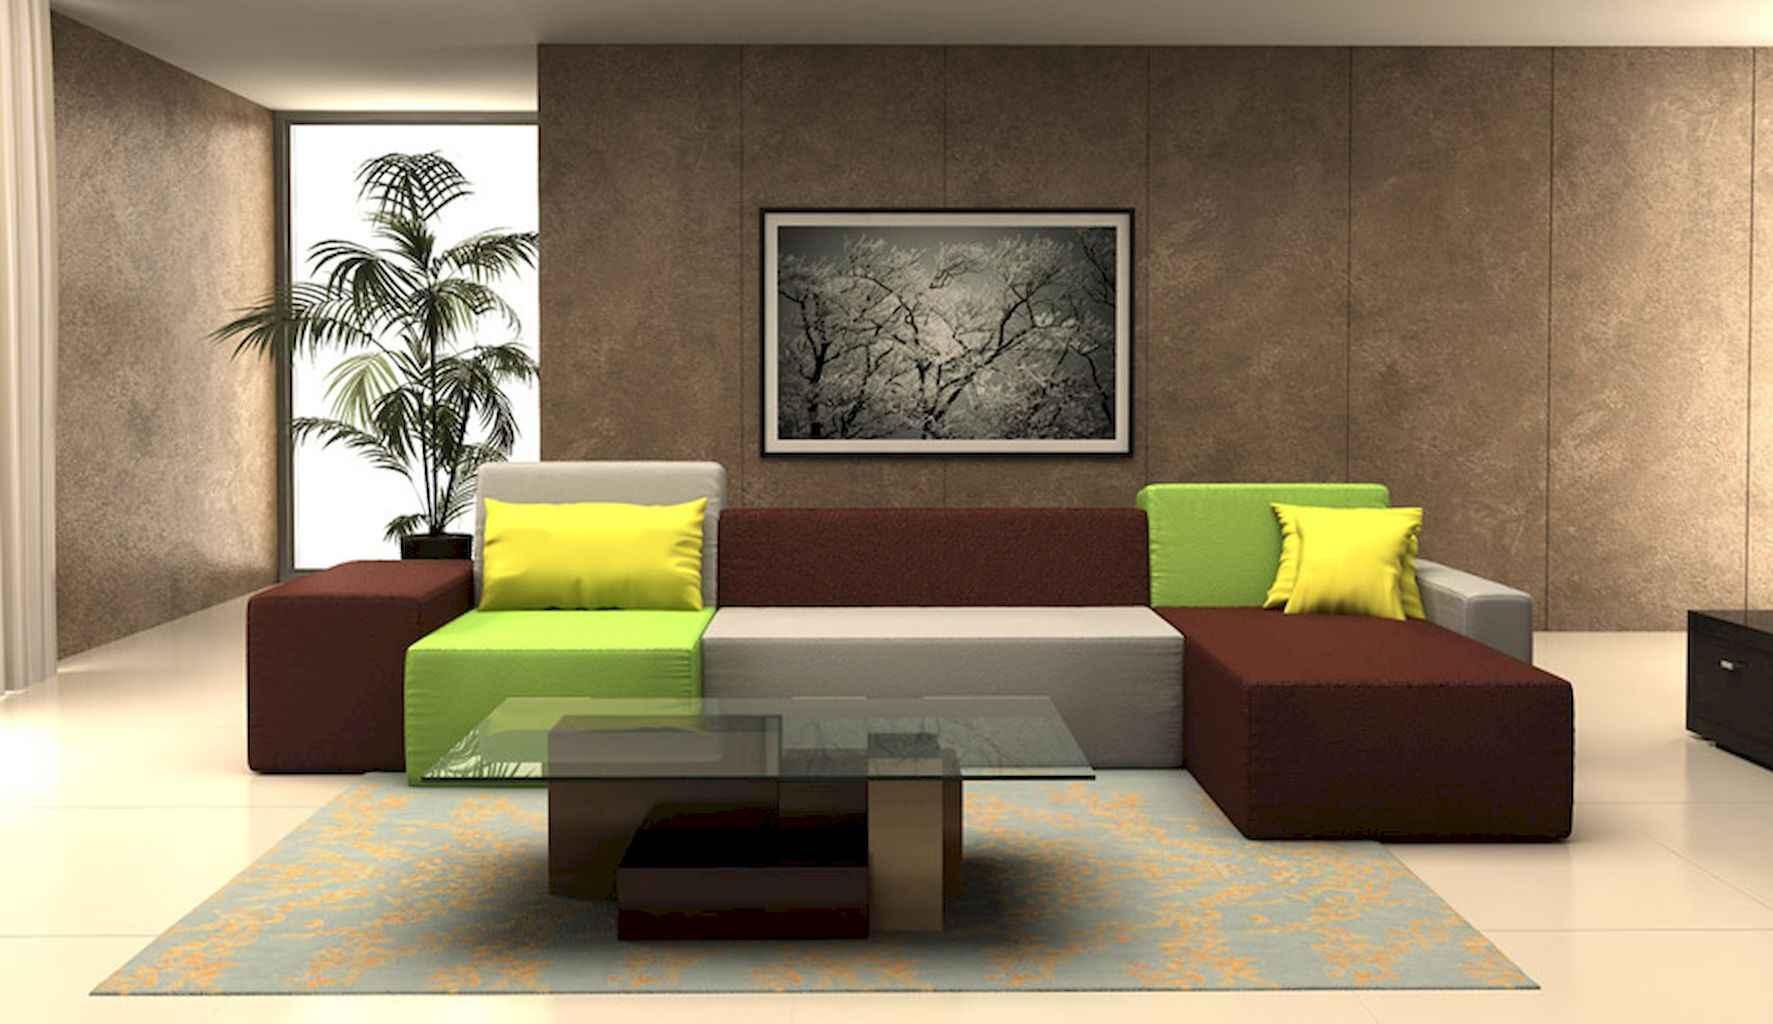 80 Elegant Harmony Interior Design Ideas For First Couple (1)